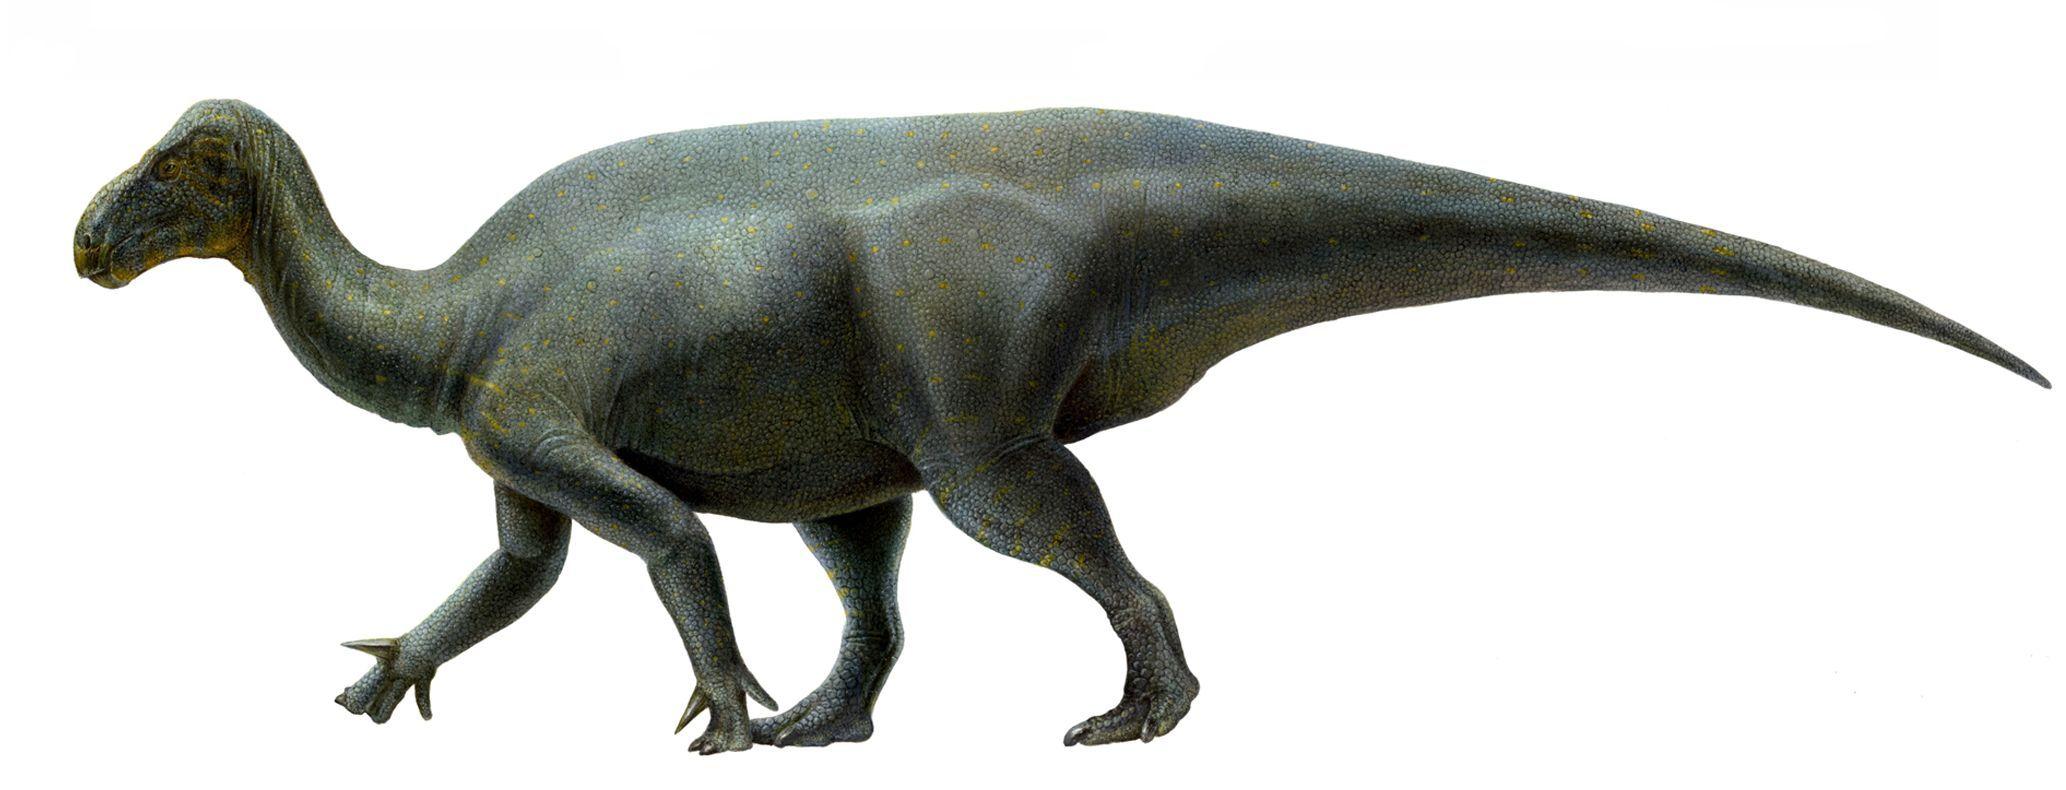 Iguanacolossus fortis. Dinosauria, Ornithischia, Ornithopoda, Styracosterna. Auteur : Lukas Panzarin, 2010.